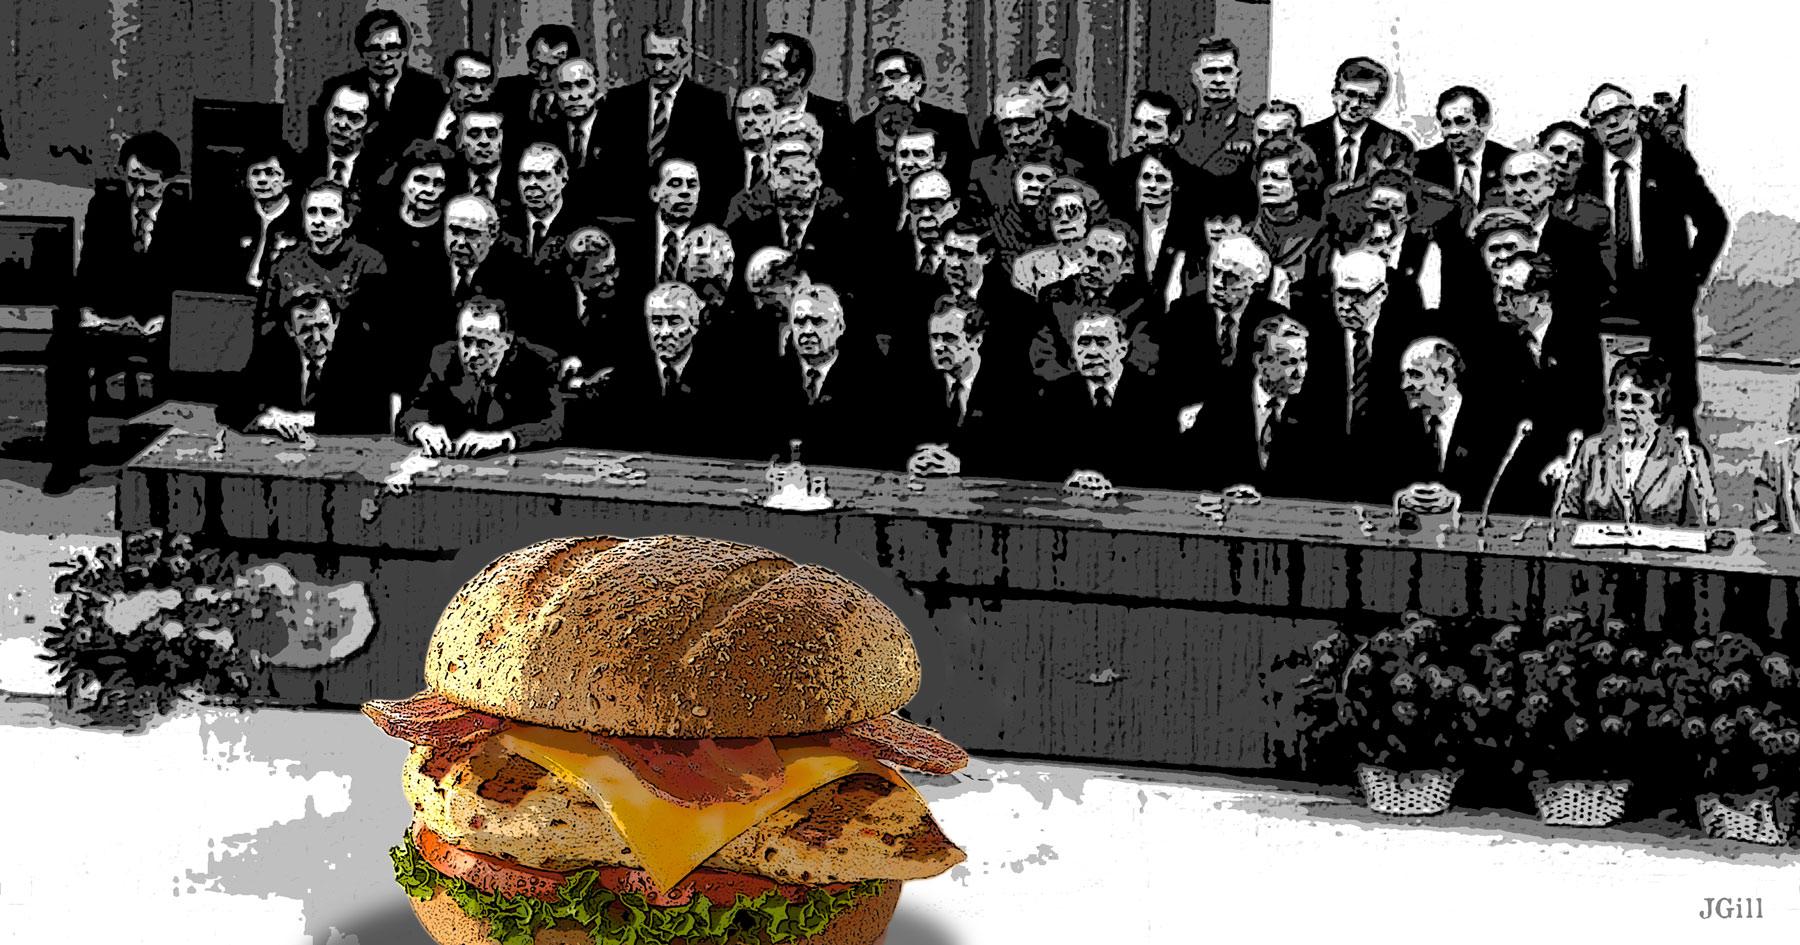 Chicken Politburo, politics, photomontage, Paul Jacob, James Gill, collage